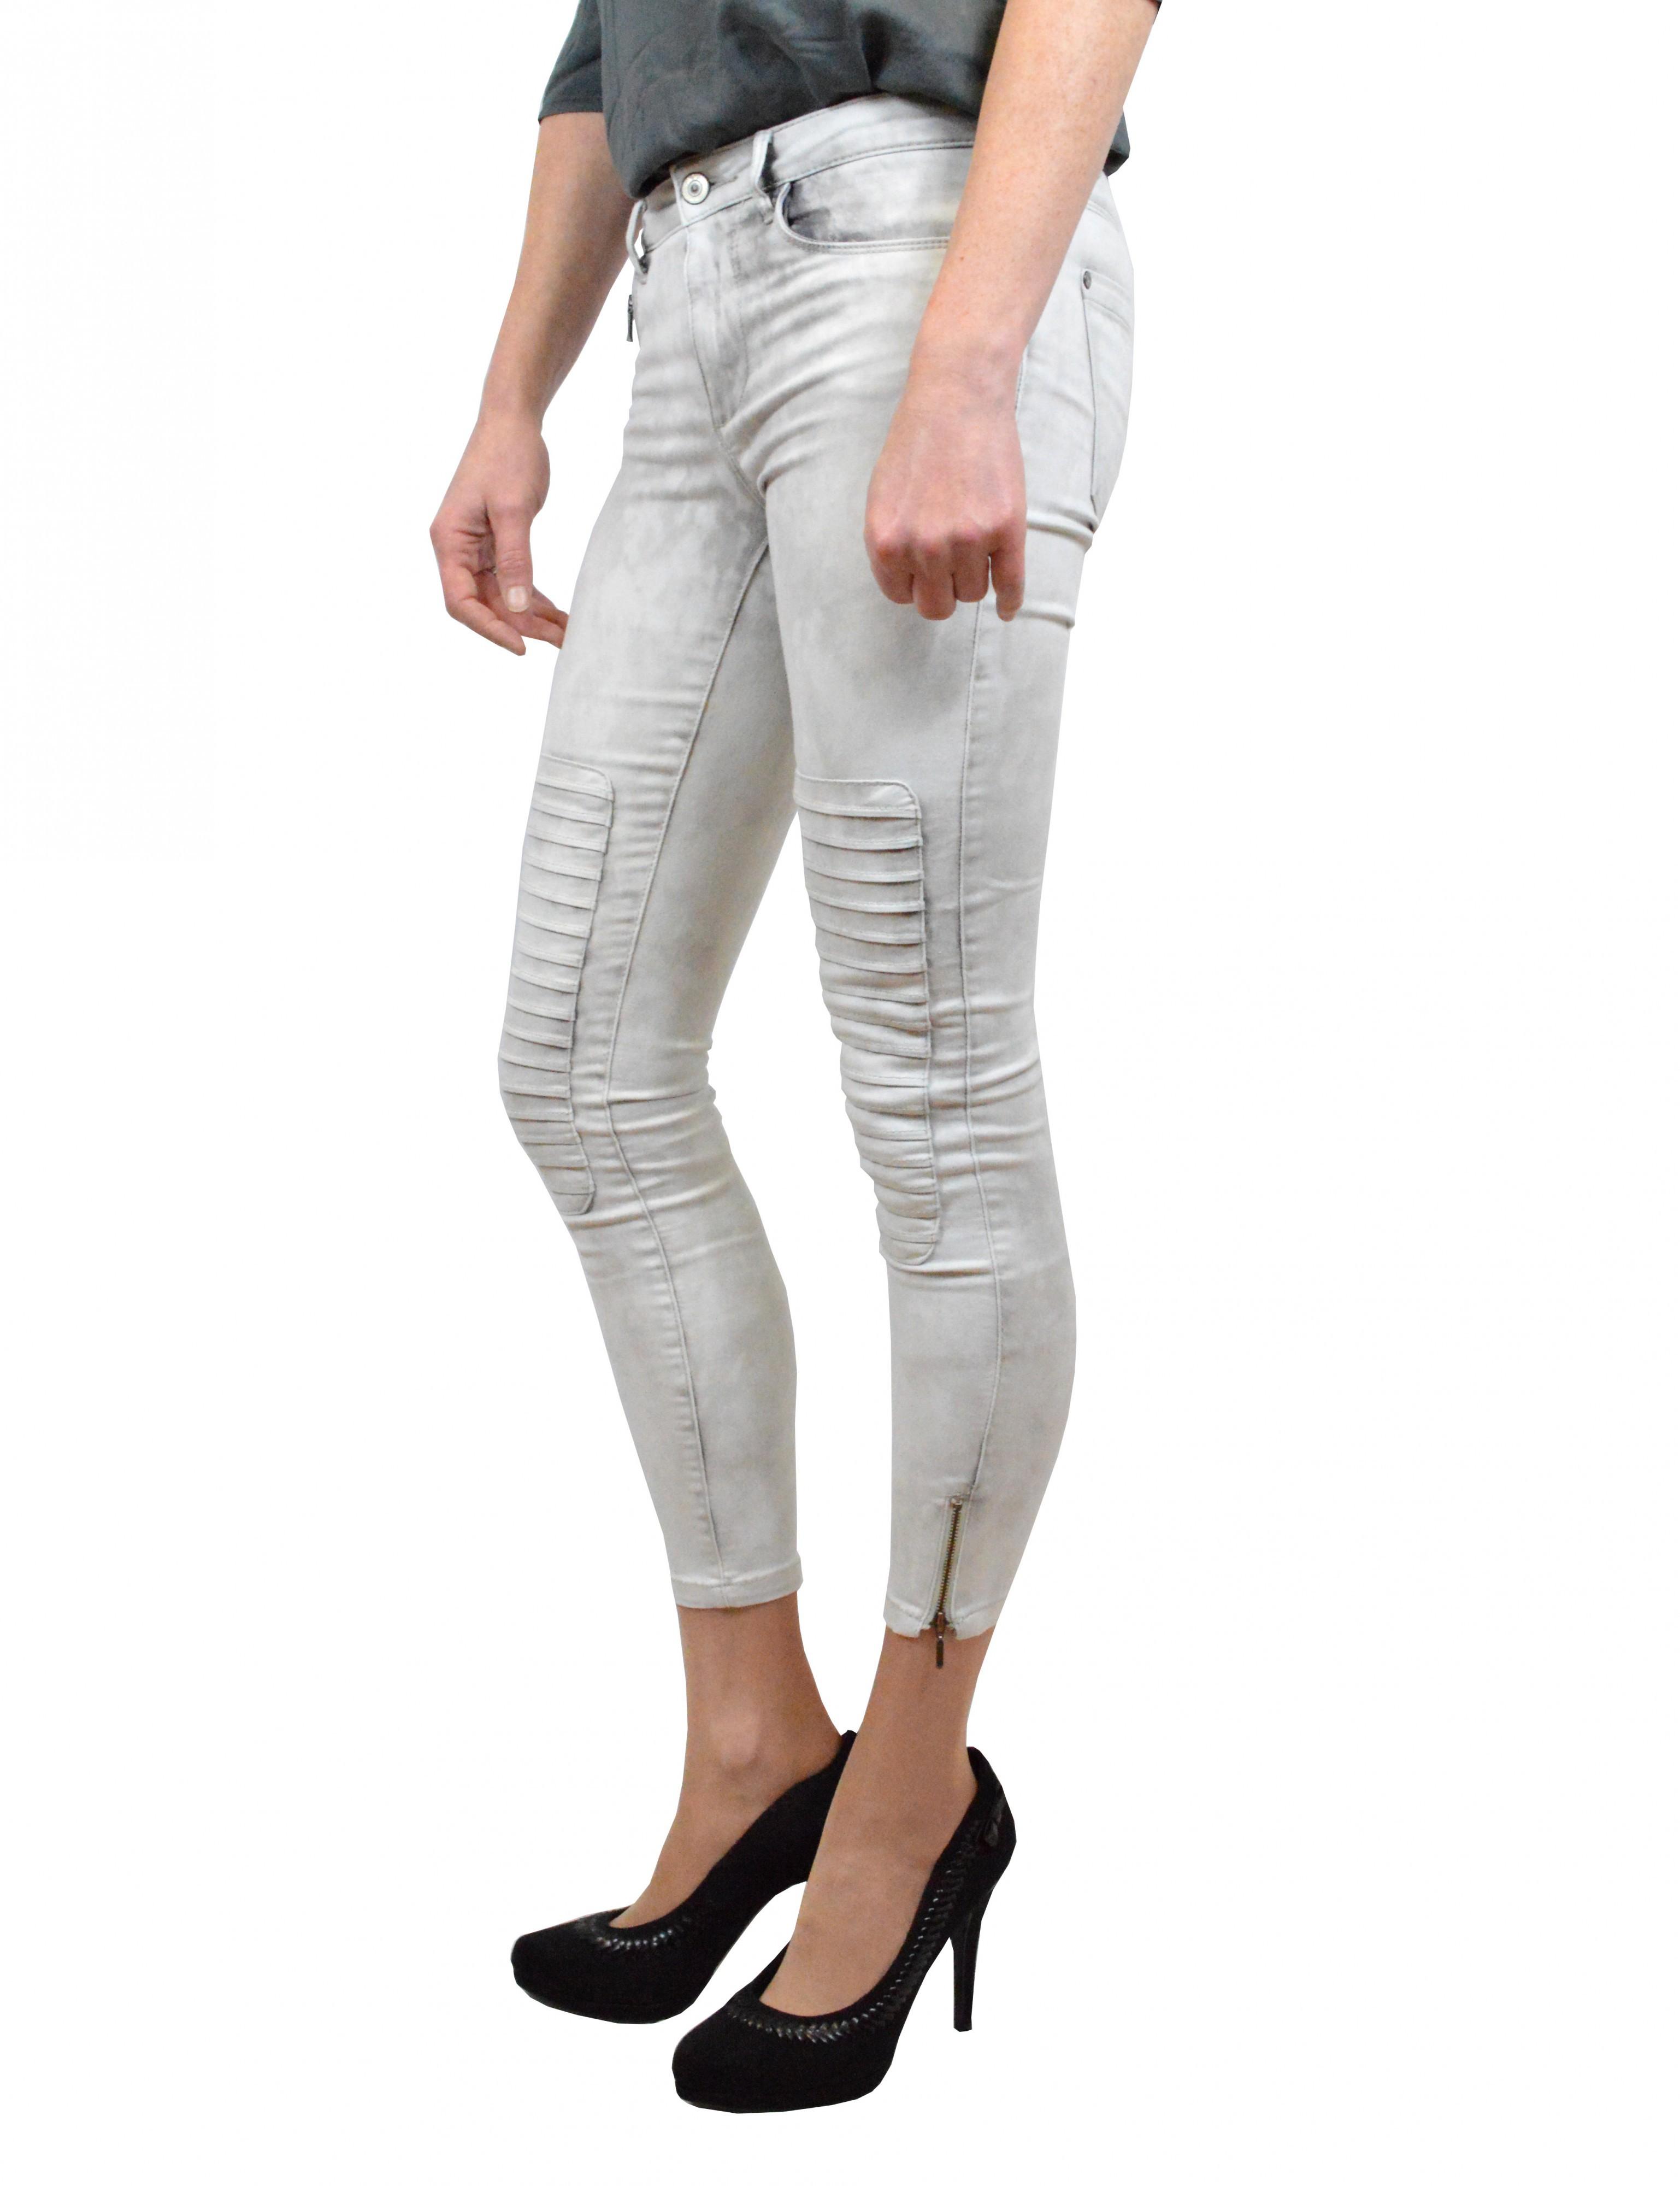 ONLY Damen Jeans Leggings onlROYAL REG SK ANKLE RACE PIM 403 biker denim  knöchellang – Bild e12b939ea2